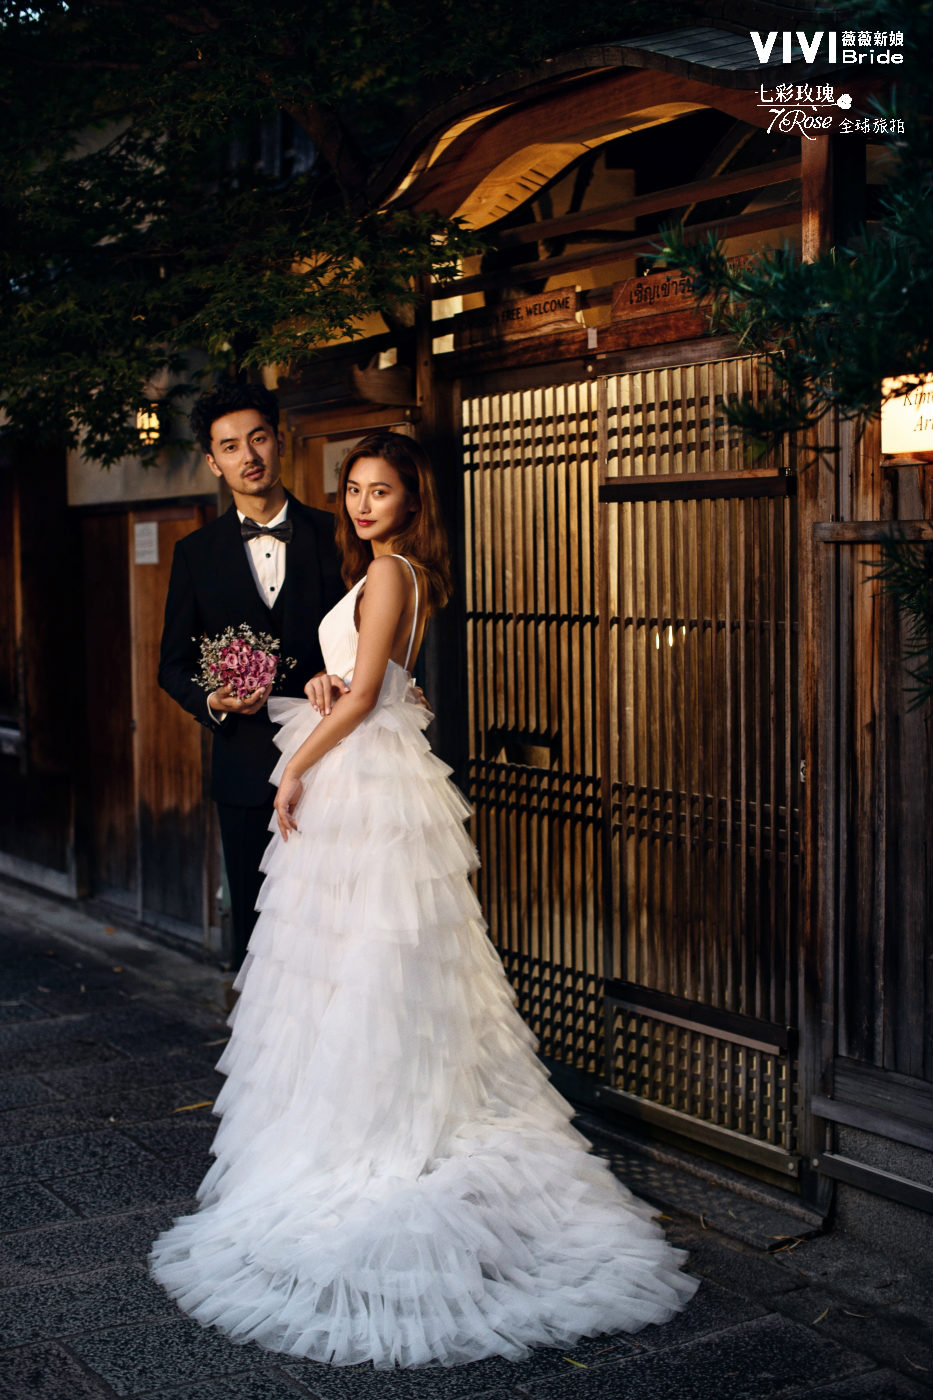 8 - VIVI Bride 薇薇新娘 婚紗攝影《結婚吧》